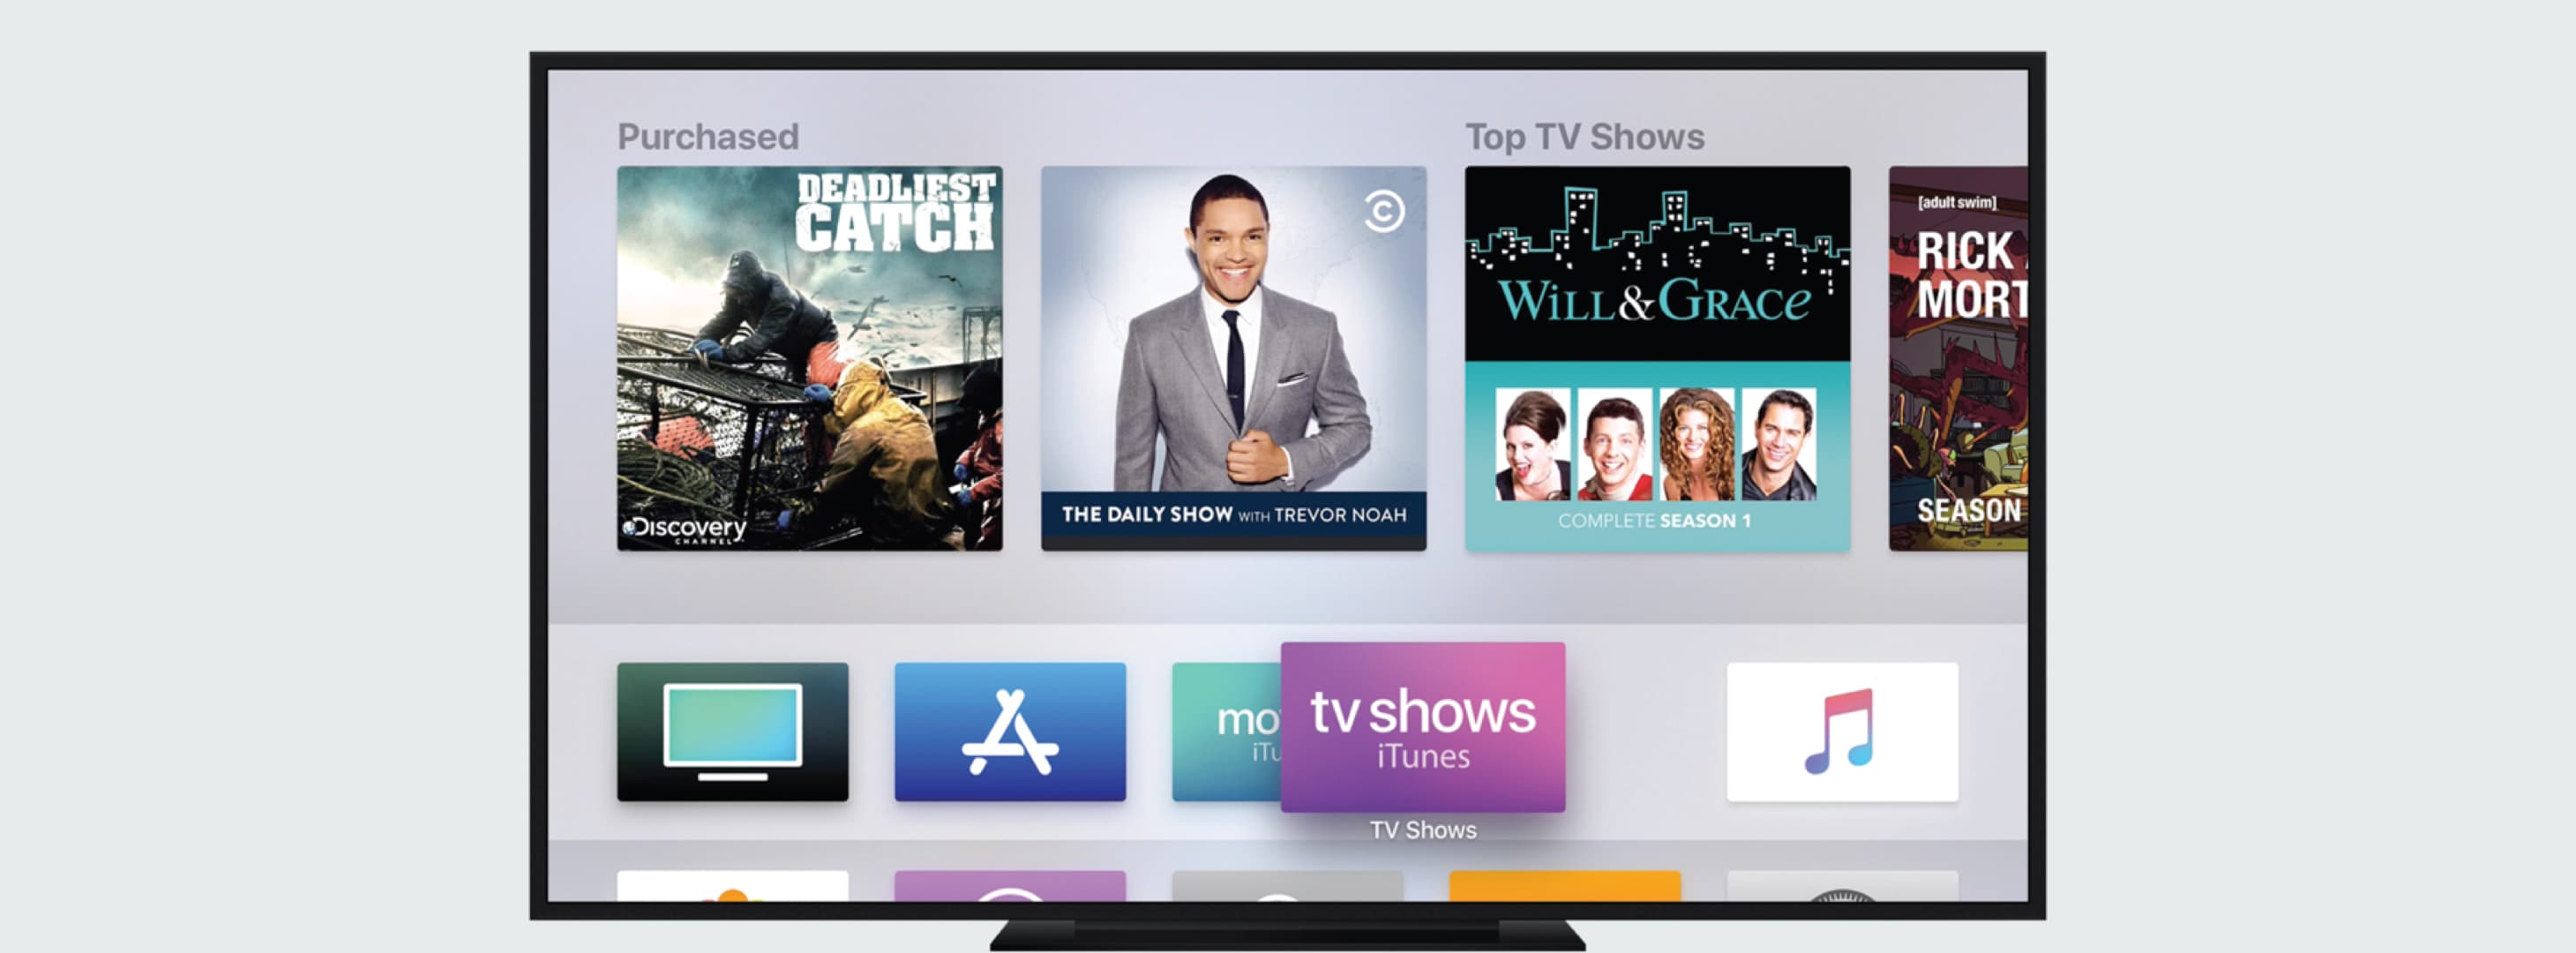 allapplenews-apple-tv-selection-screen